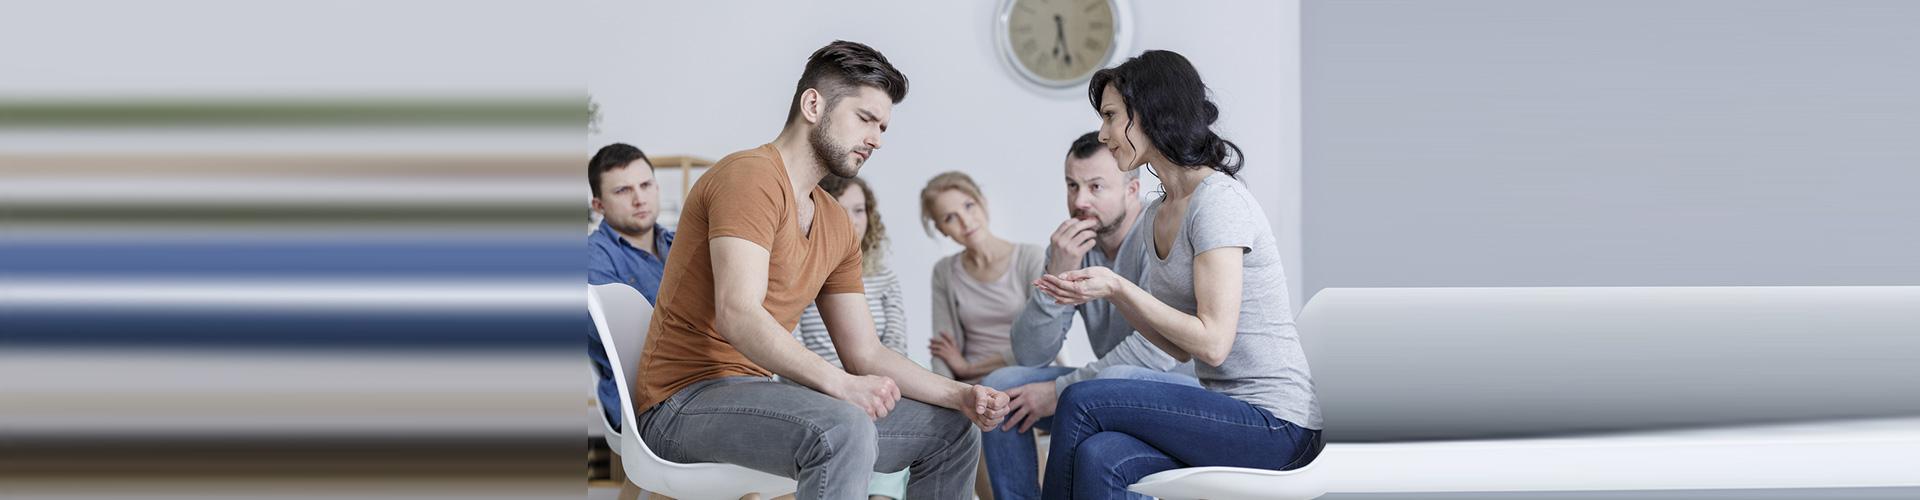 six people sitting